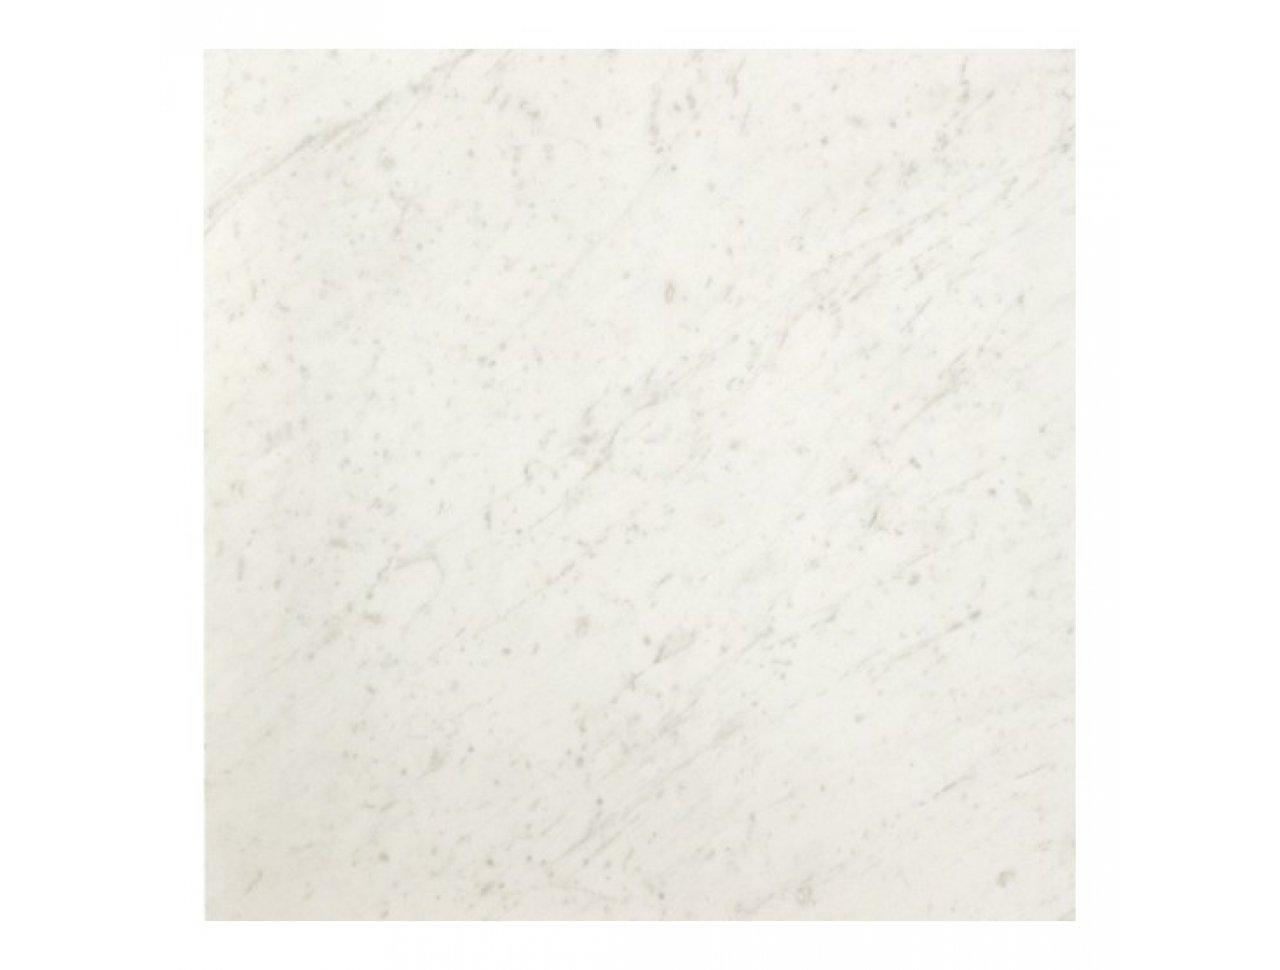 Напольная плитка FAP Roma Diamond Carrara Brillante 60 x 60 см, Арт. fNES